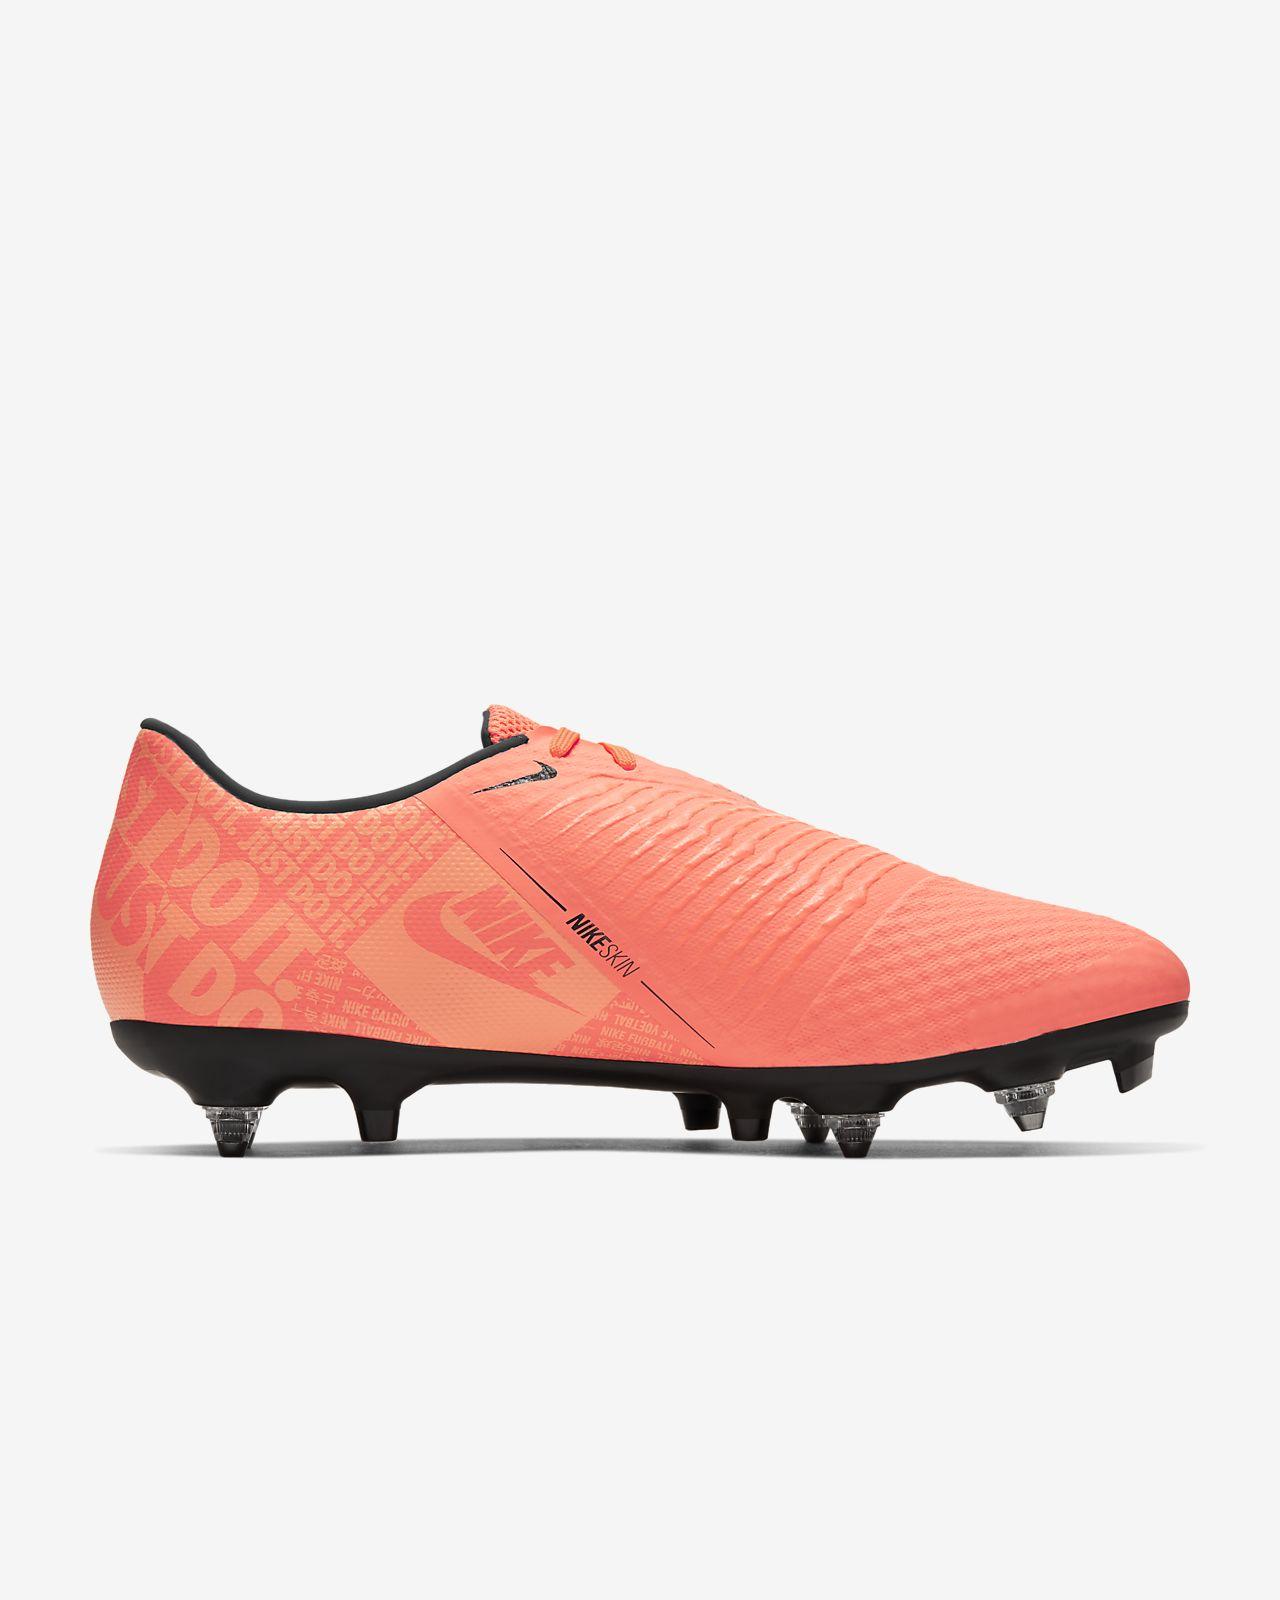 Chaussure de football à crampons pour terrain gras Nike PhantomVNM Academy SG Pro Anti Clog Traction